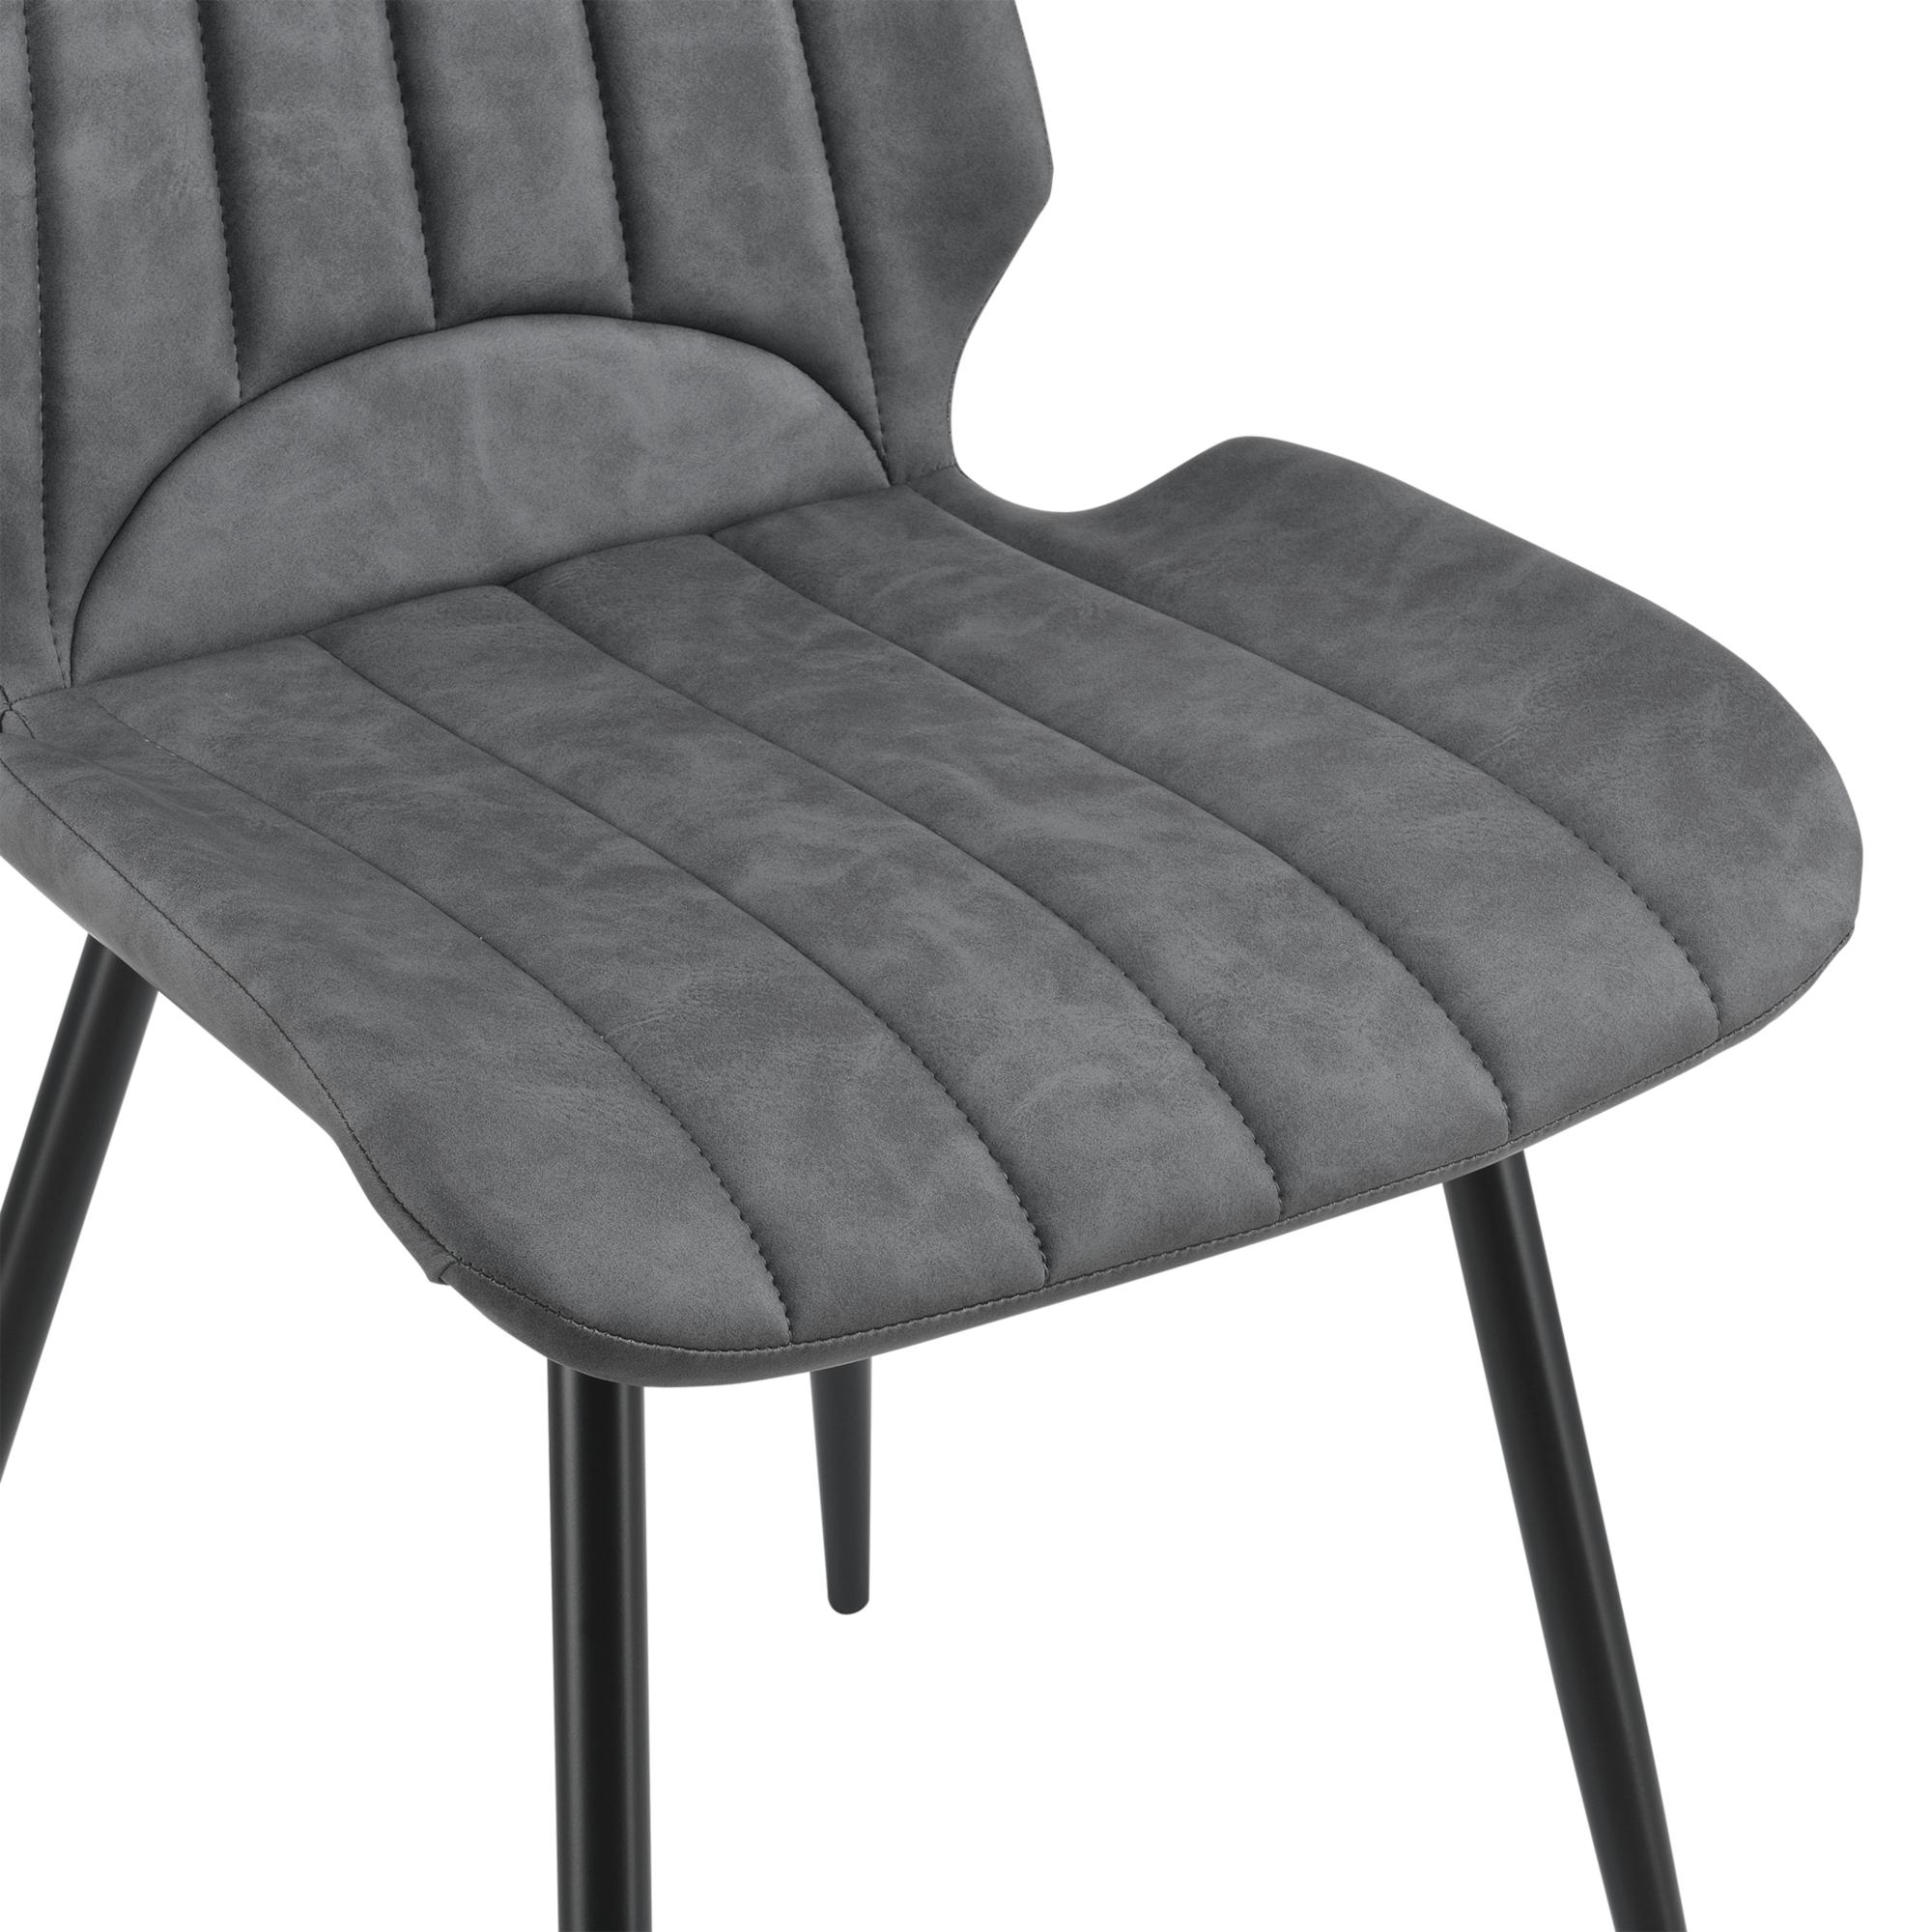 en.casa 4x Stühle Dunkelgrau Lehnstuhl Esszimmer-Stuhl Polsterstuhl Lounge Set